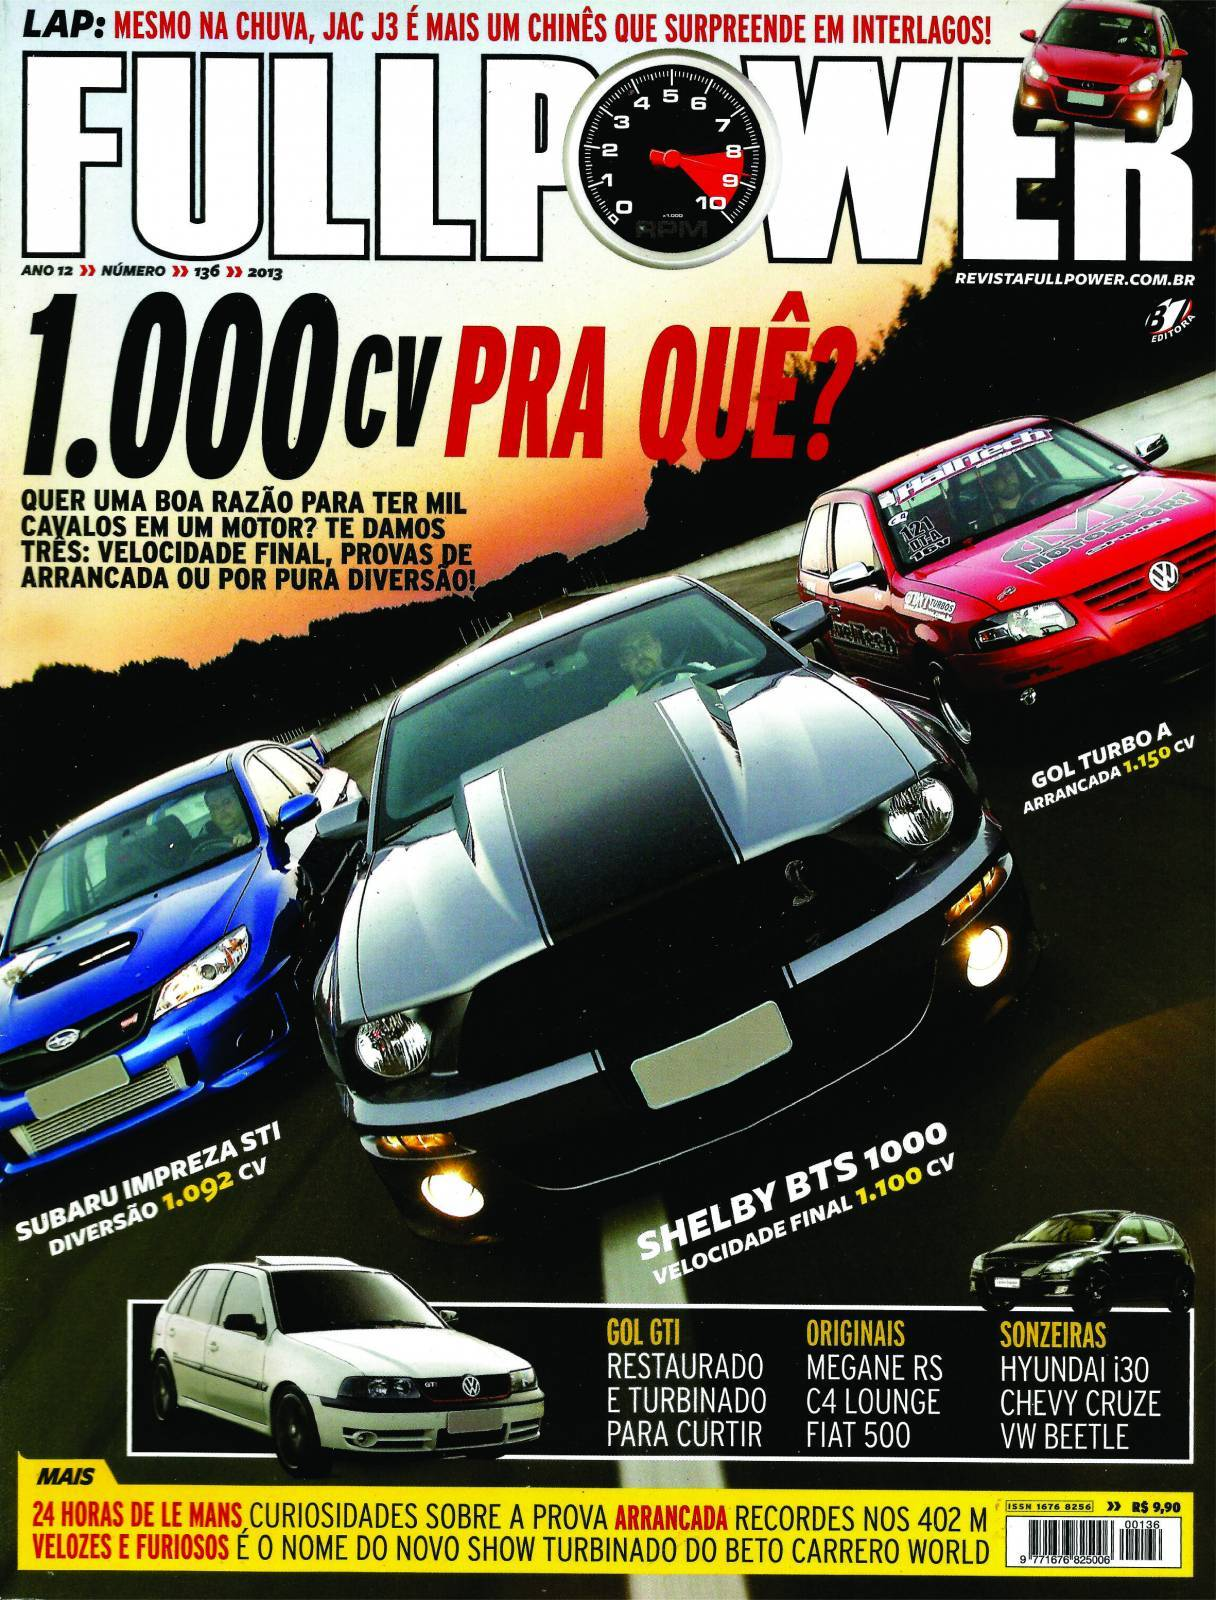 REVISTA FULLPOWER No. 136 ANO 2013 - Loja FullPower